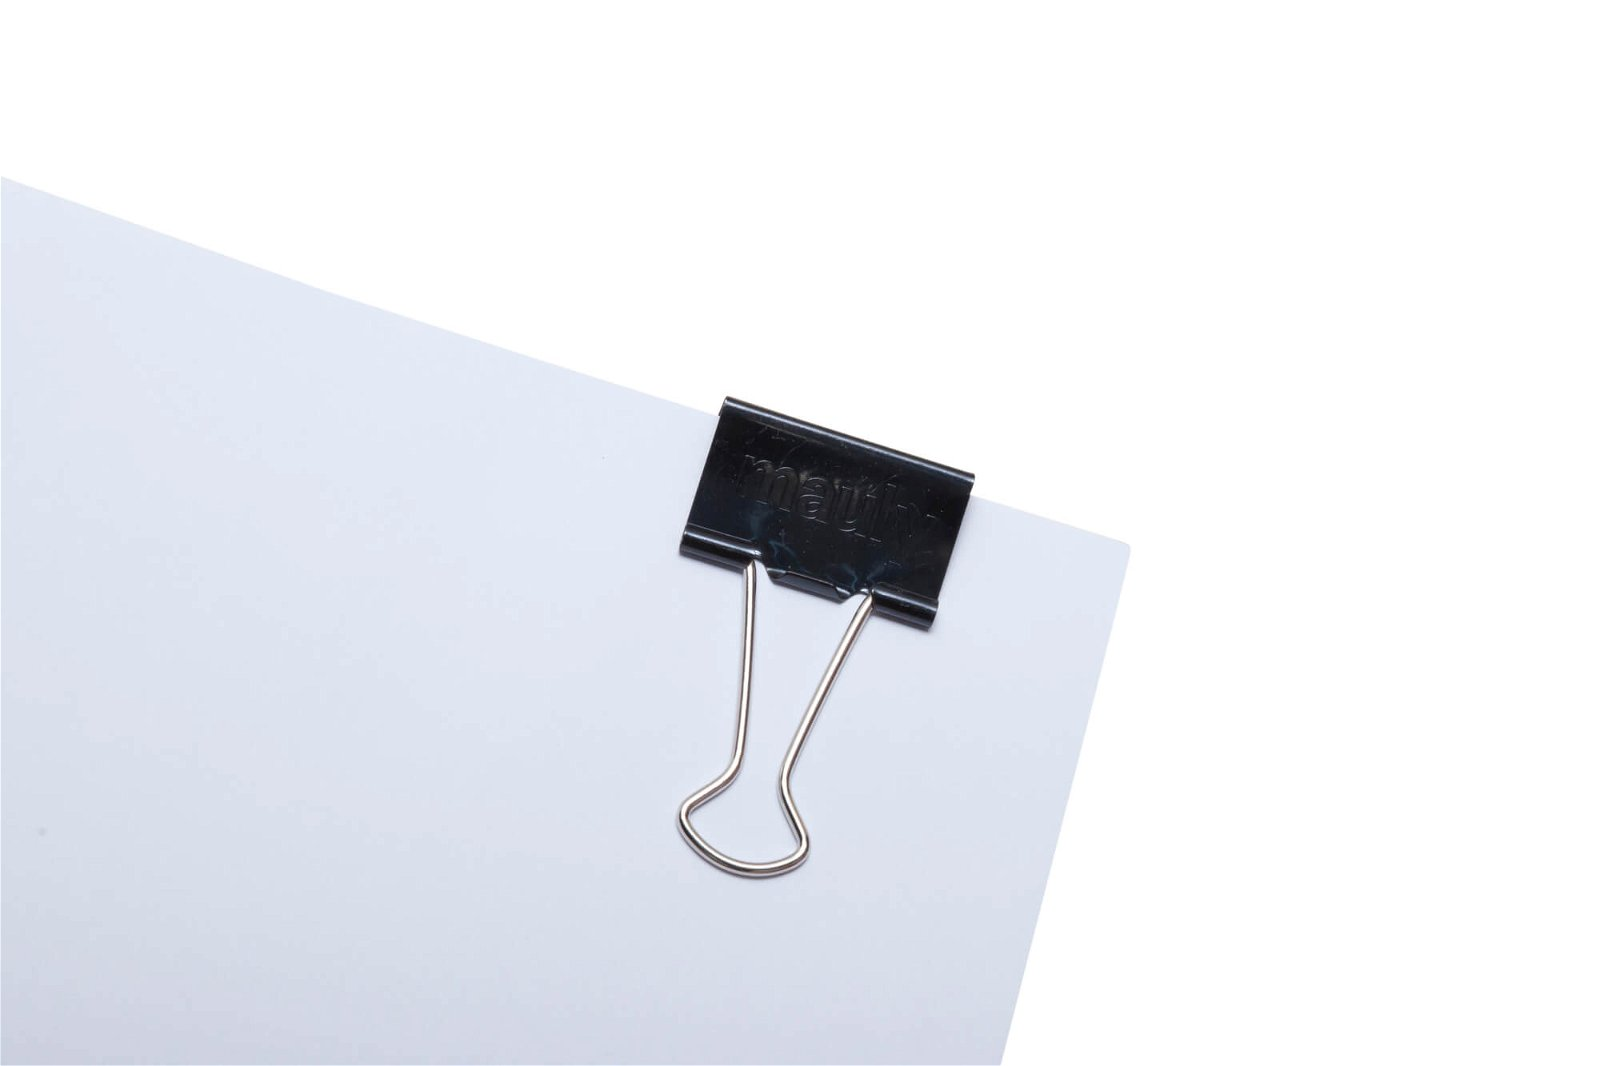 mauly 215, Breite 32 mm, 12 St./Btl., schwarz